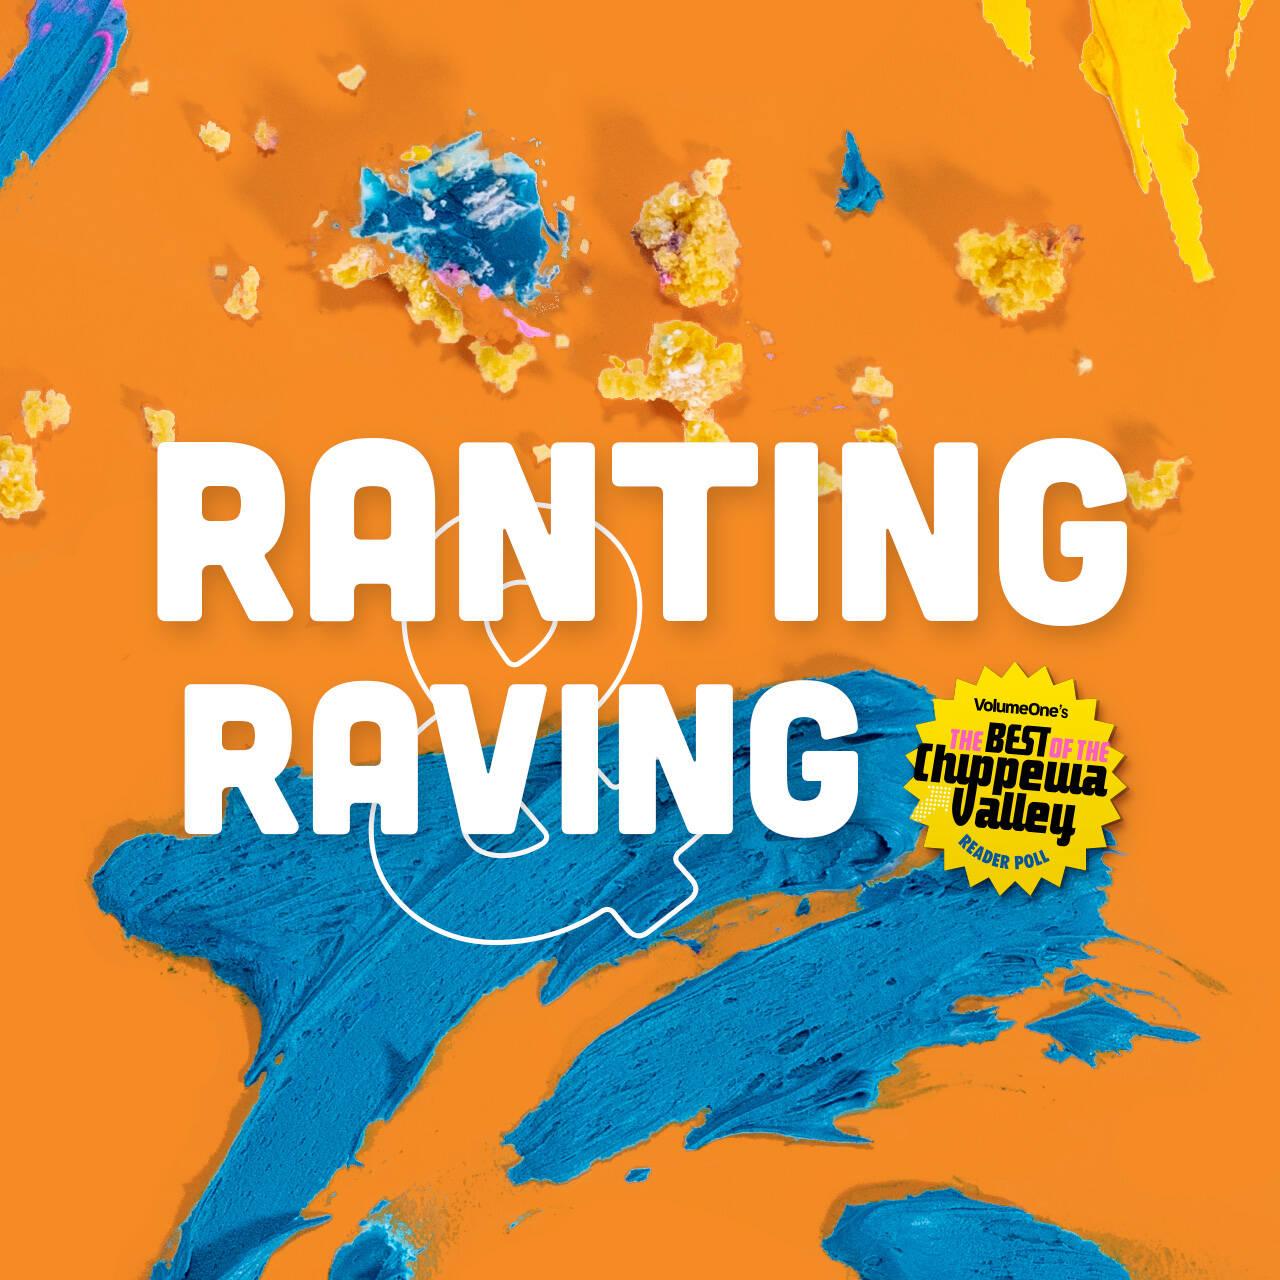 Rant and rave: Kumar